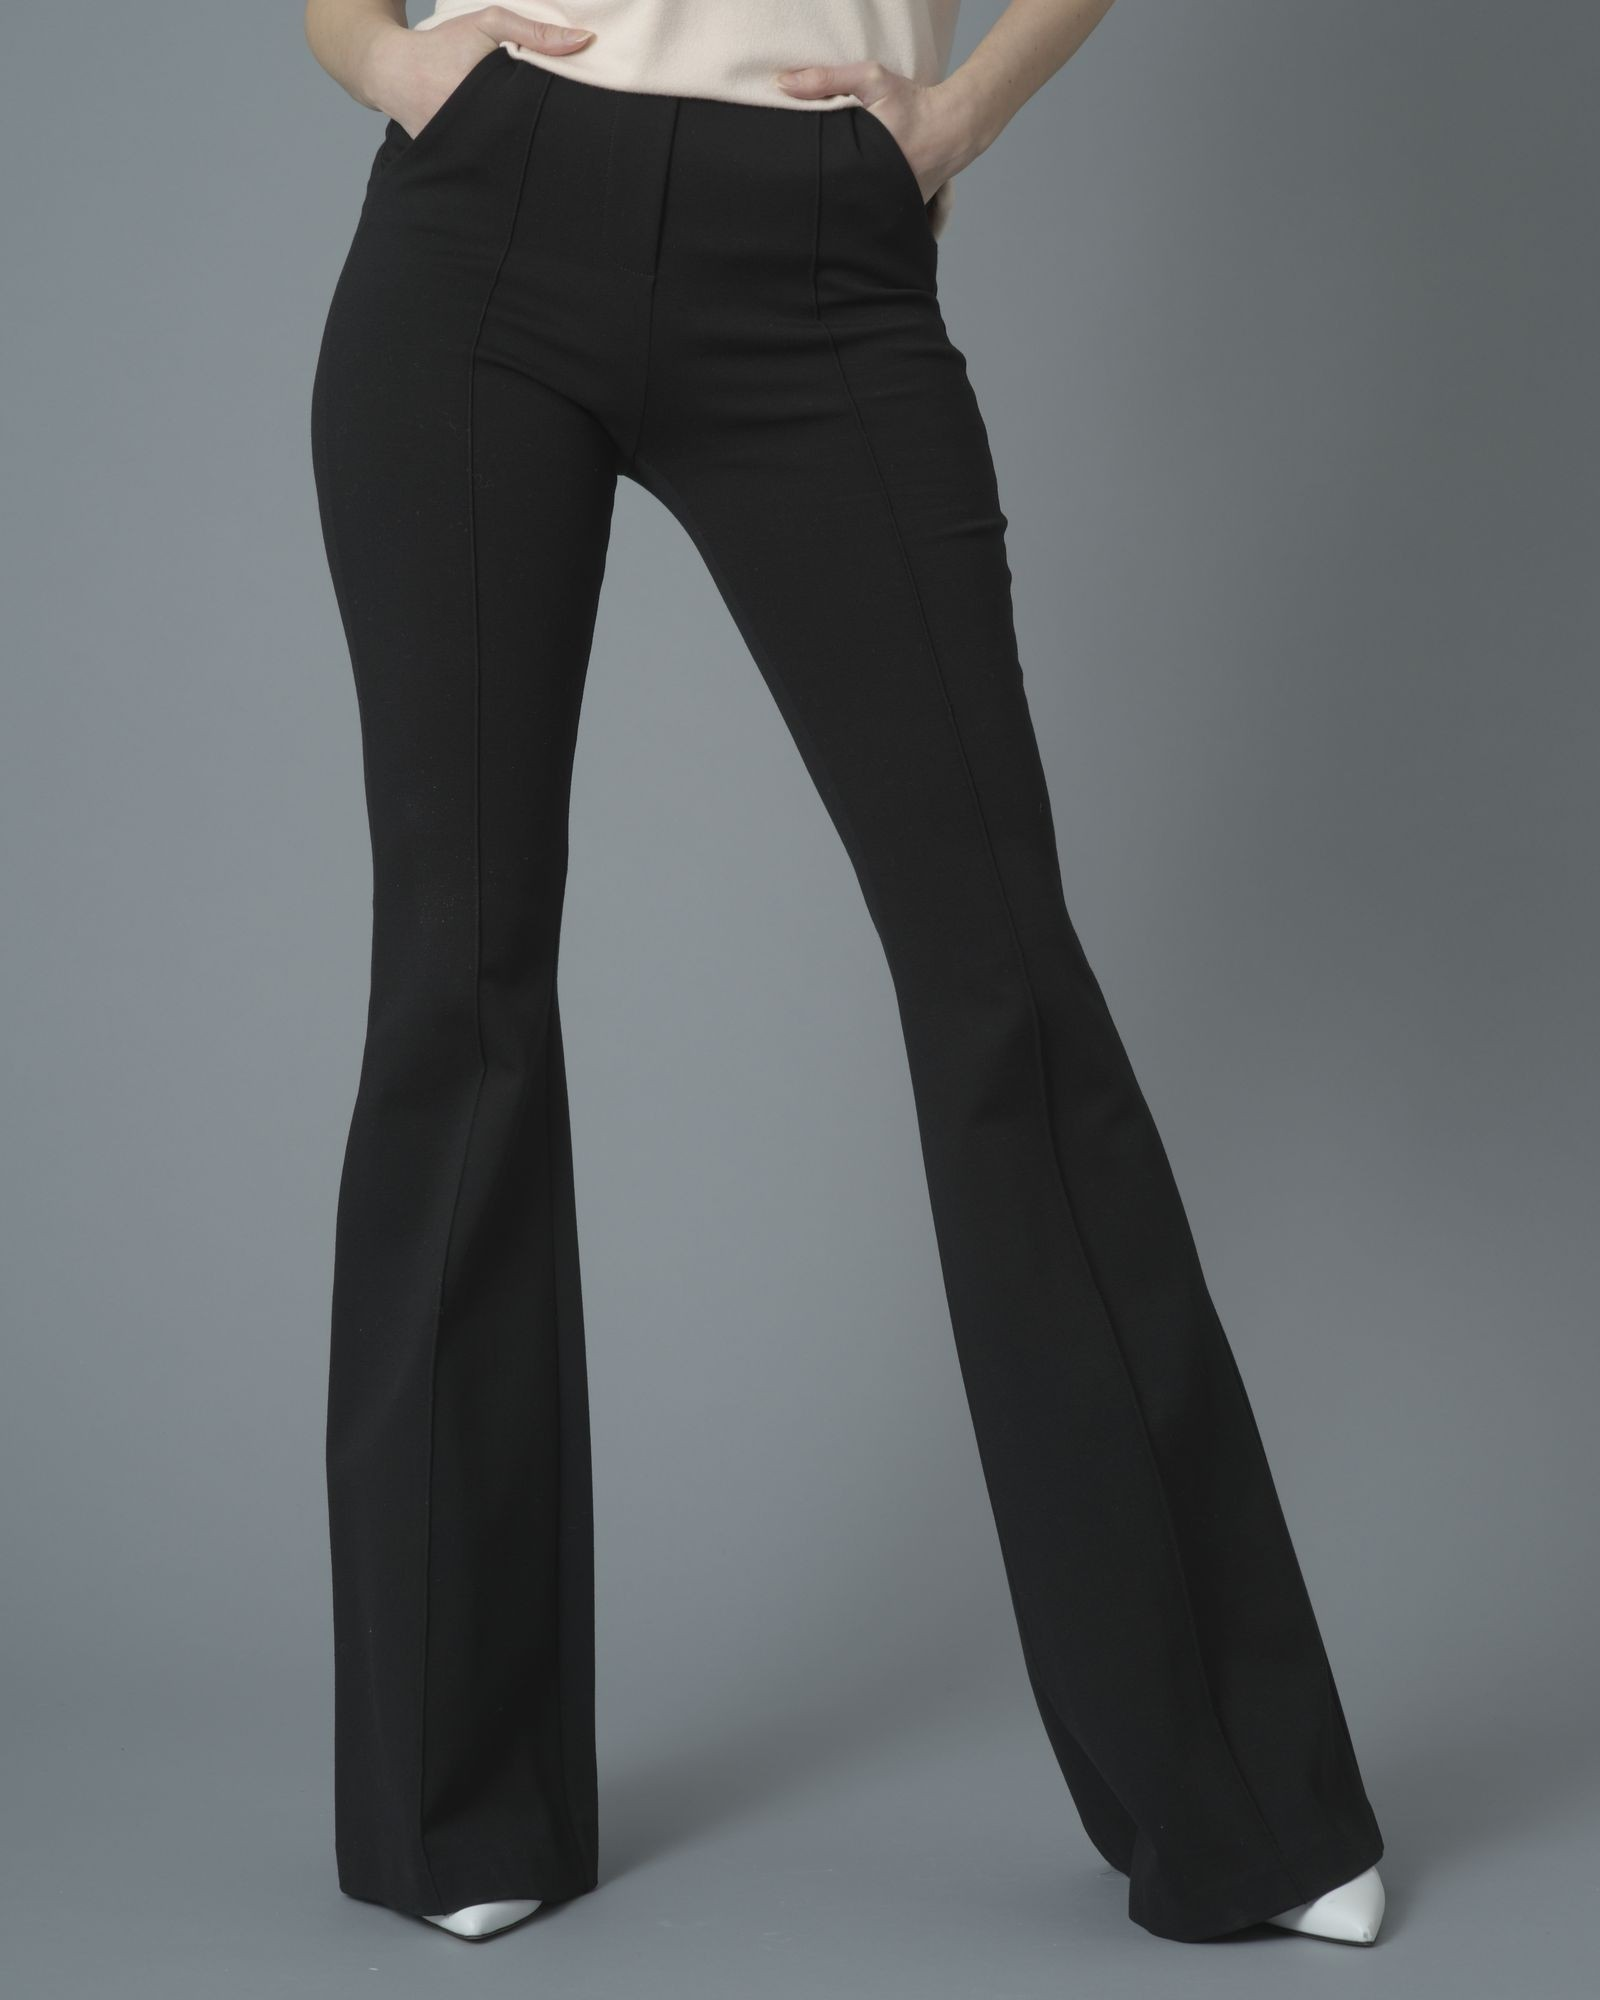 Pantalon évasé noir bande en cuir Space Simona Corsellini